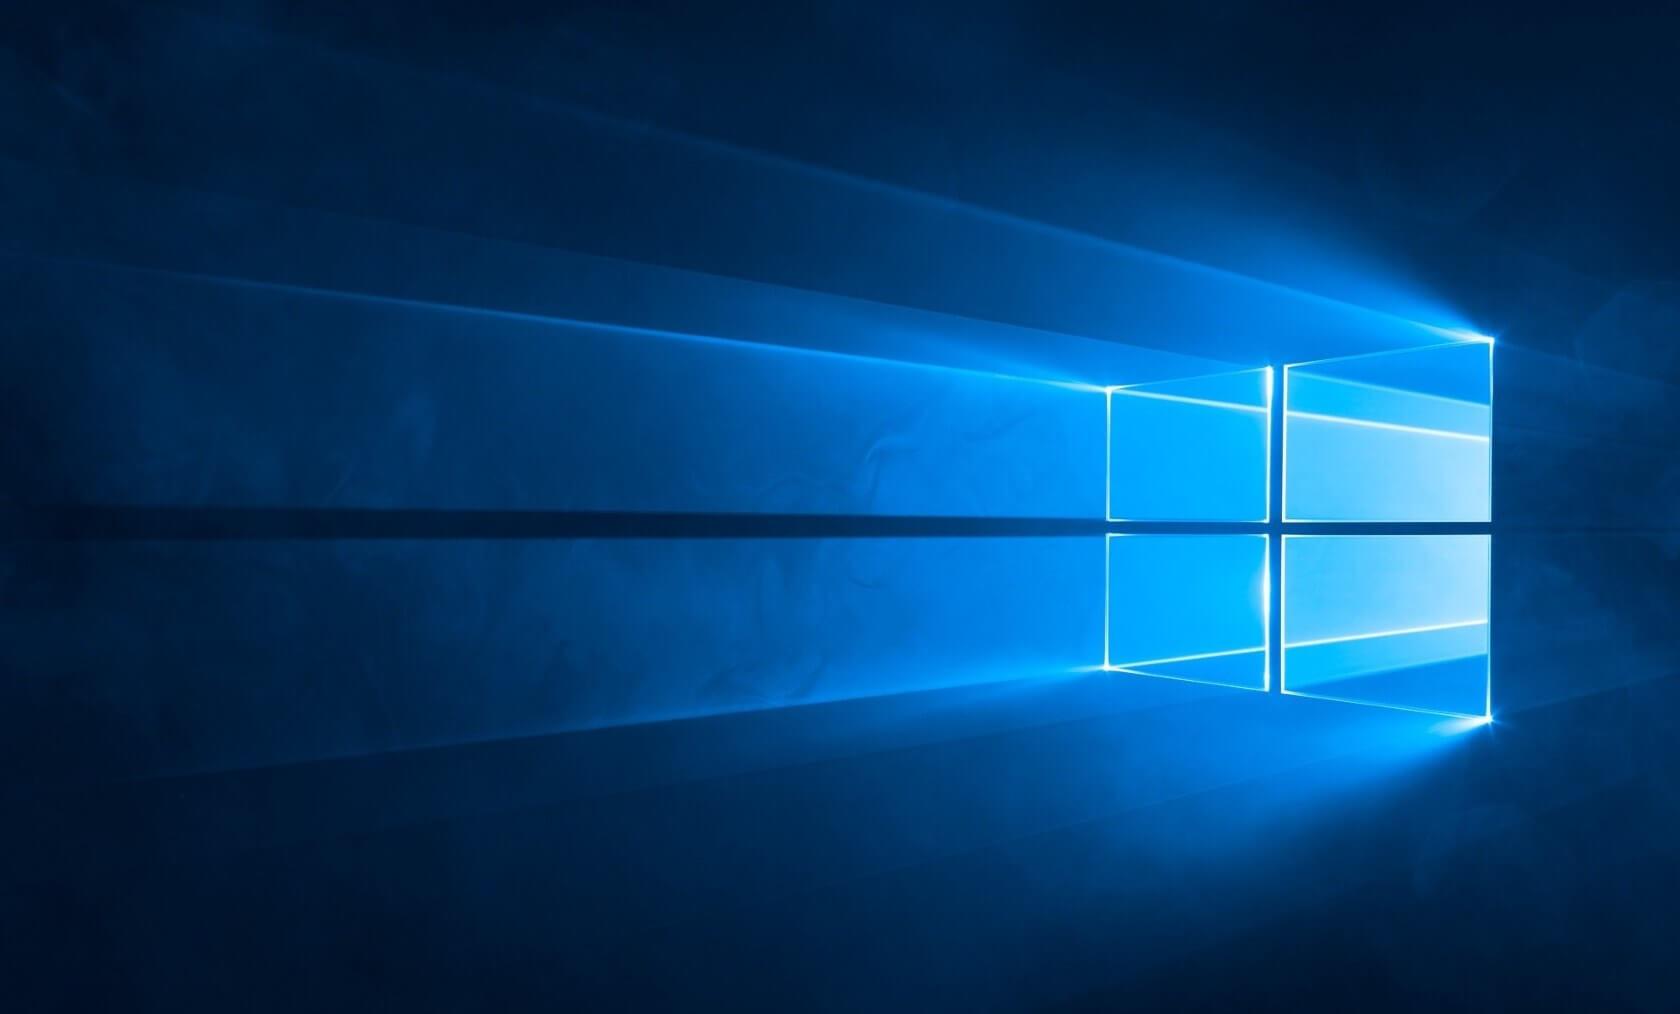 Microsoft reemplazaría Edge por su propio Chrome